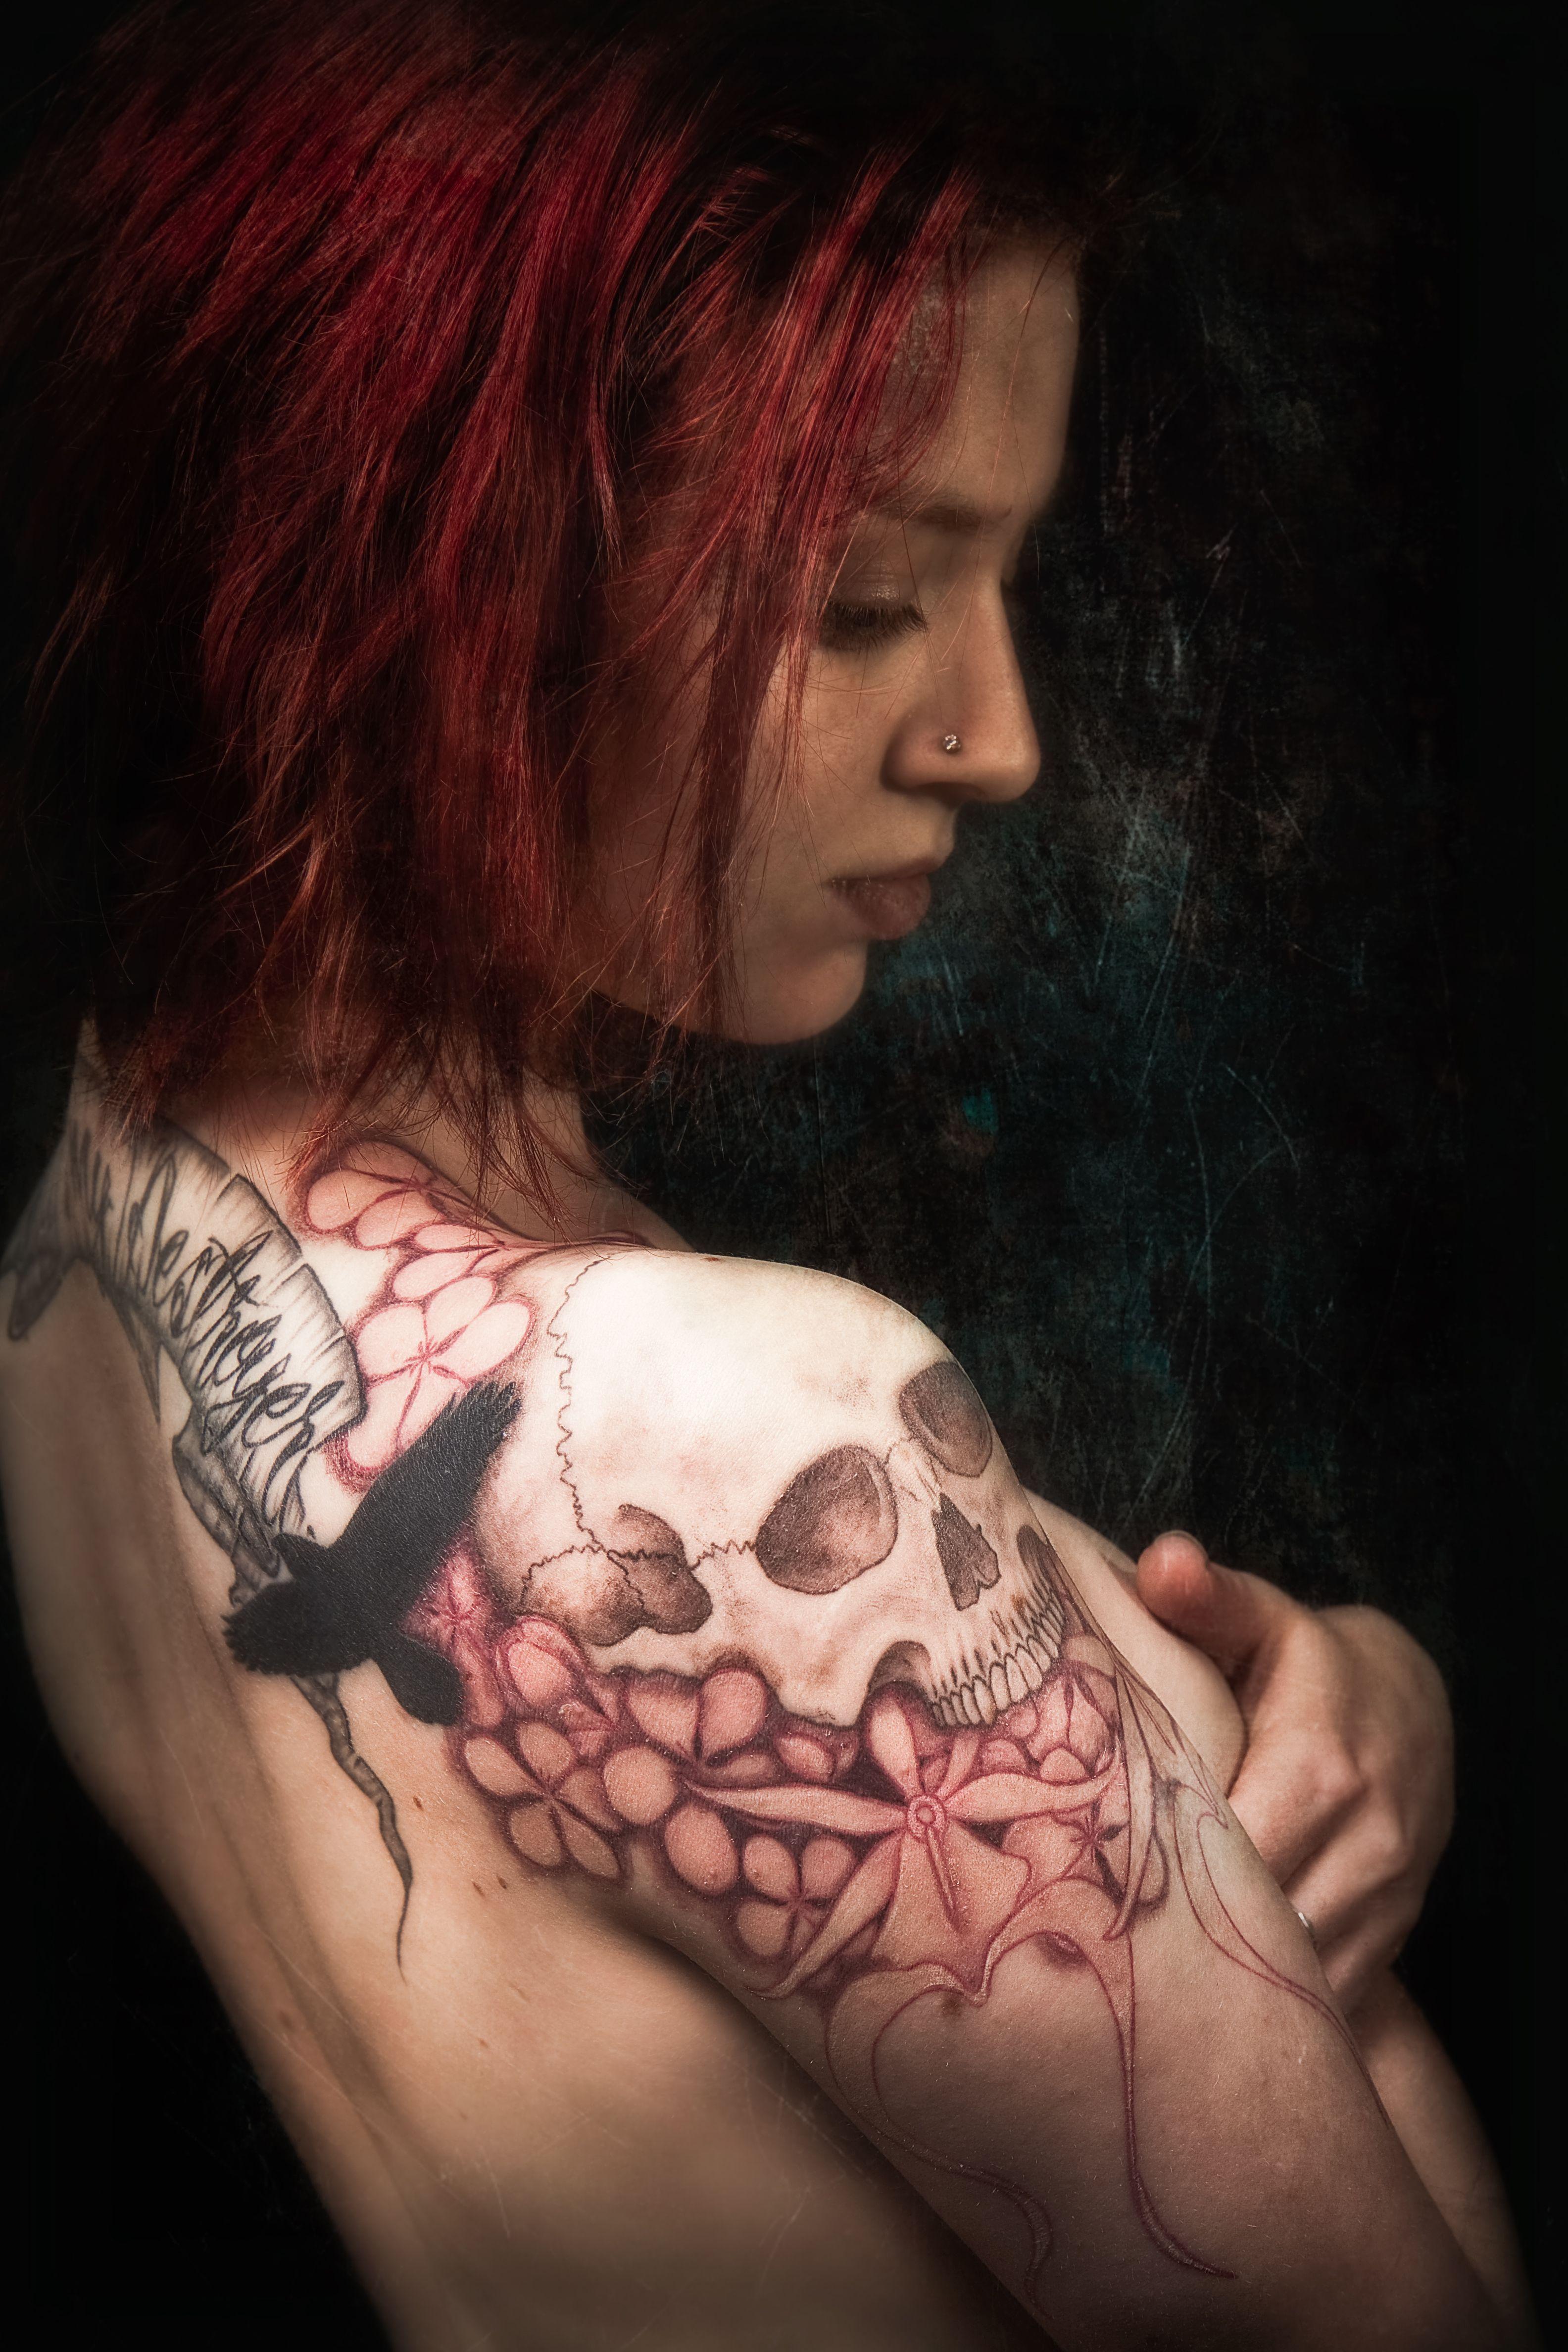 Cool tattoo ideas girls shoulder skull prophoto by meatshoptattooviantart on